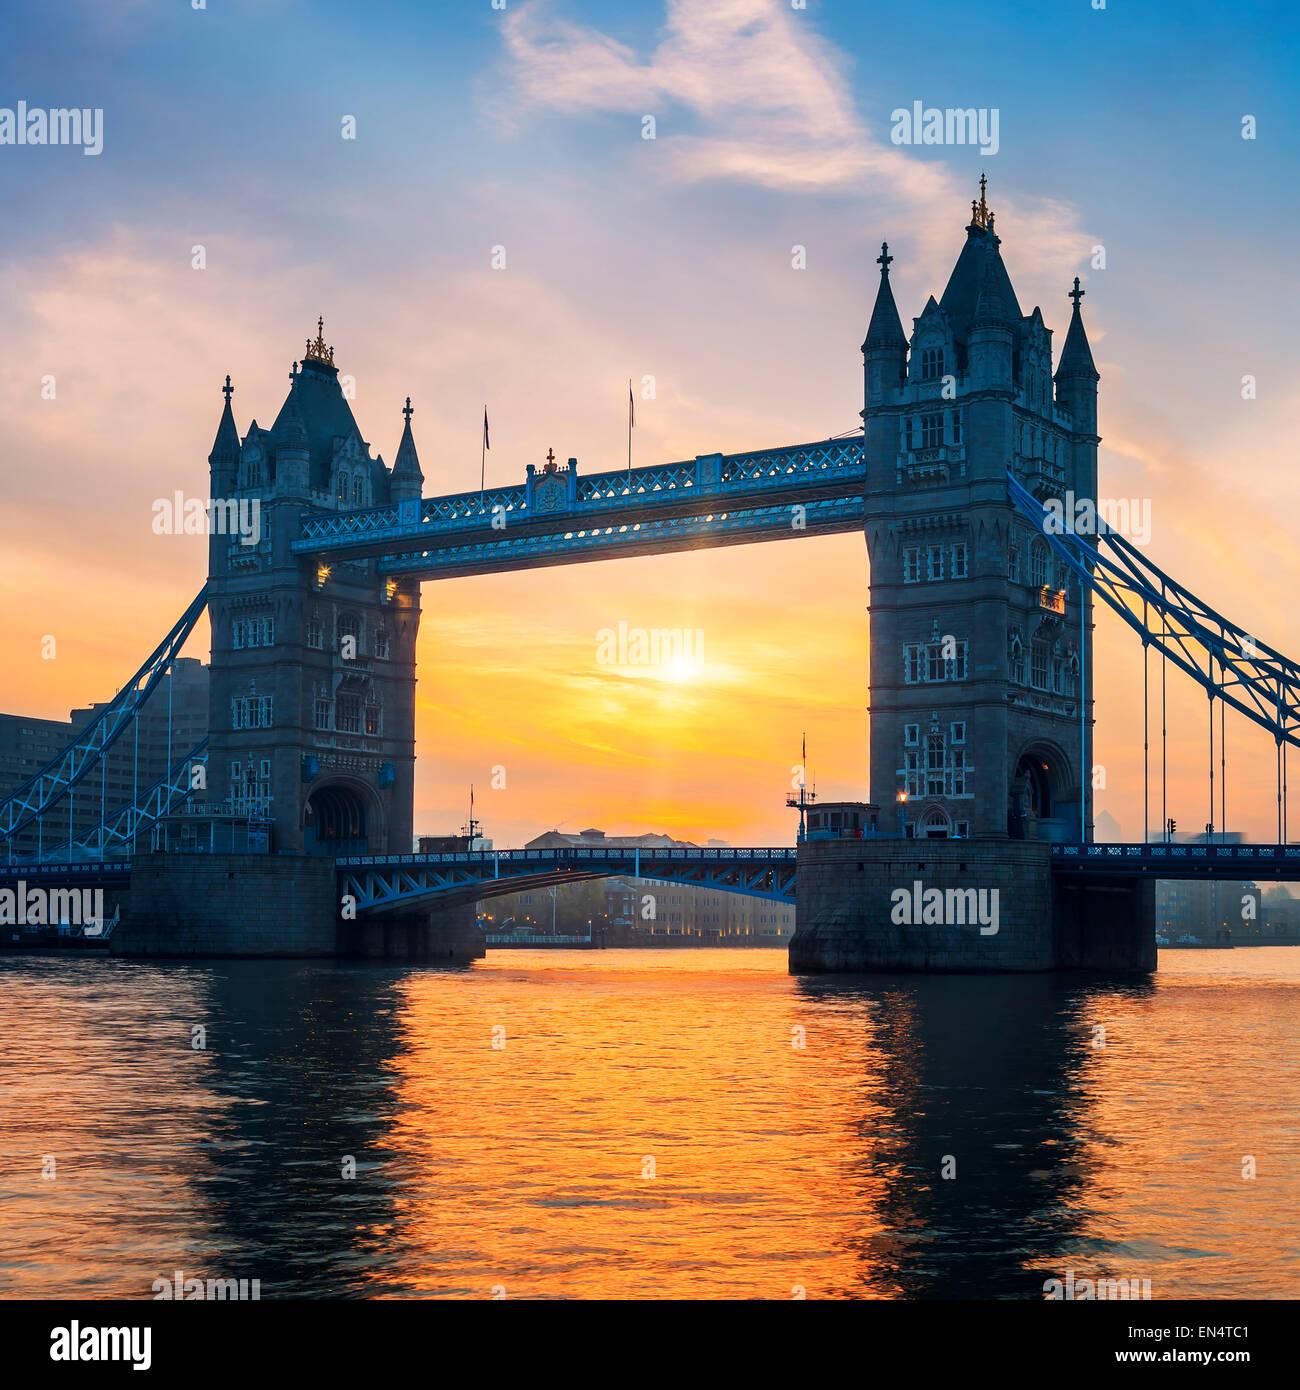 Tower Bridge bei Sonnenaufgang, London. Stockbild